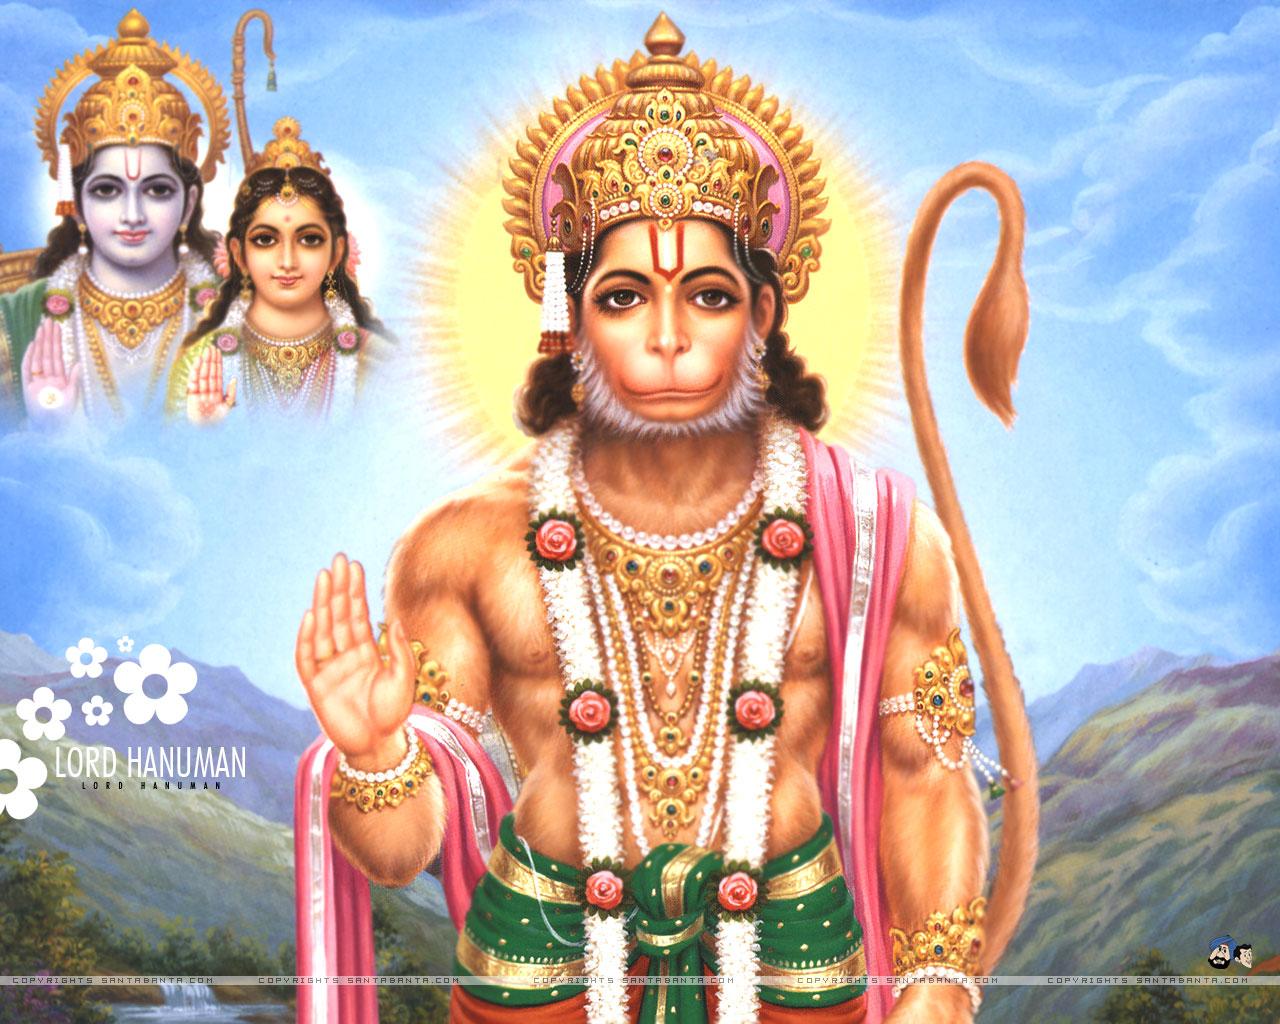 Hindu Gods Hd Wallpapers Lord Hanuman Wallpapers